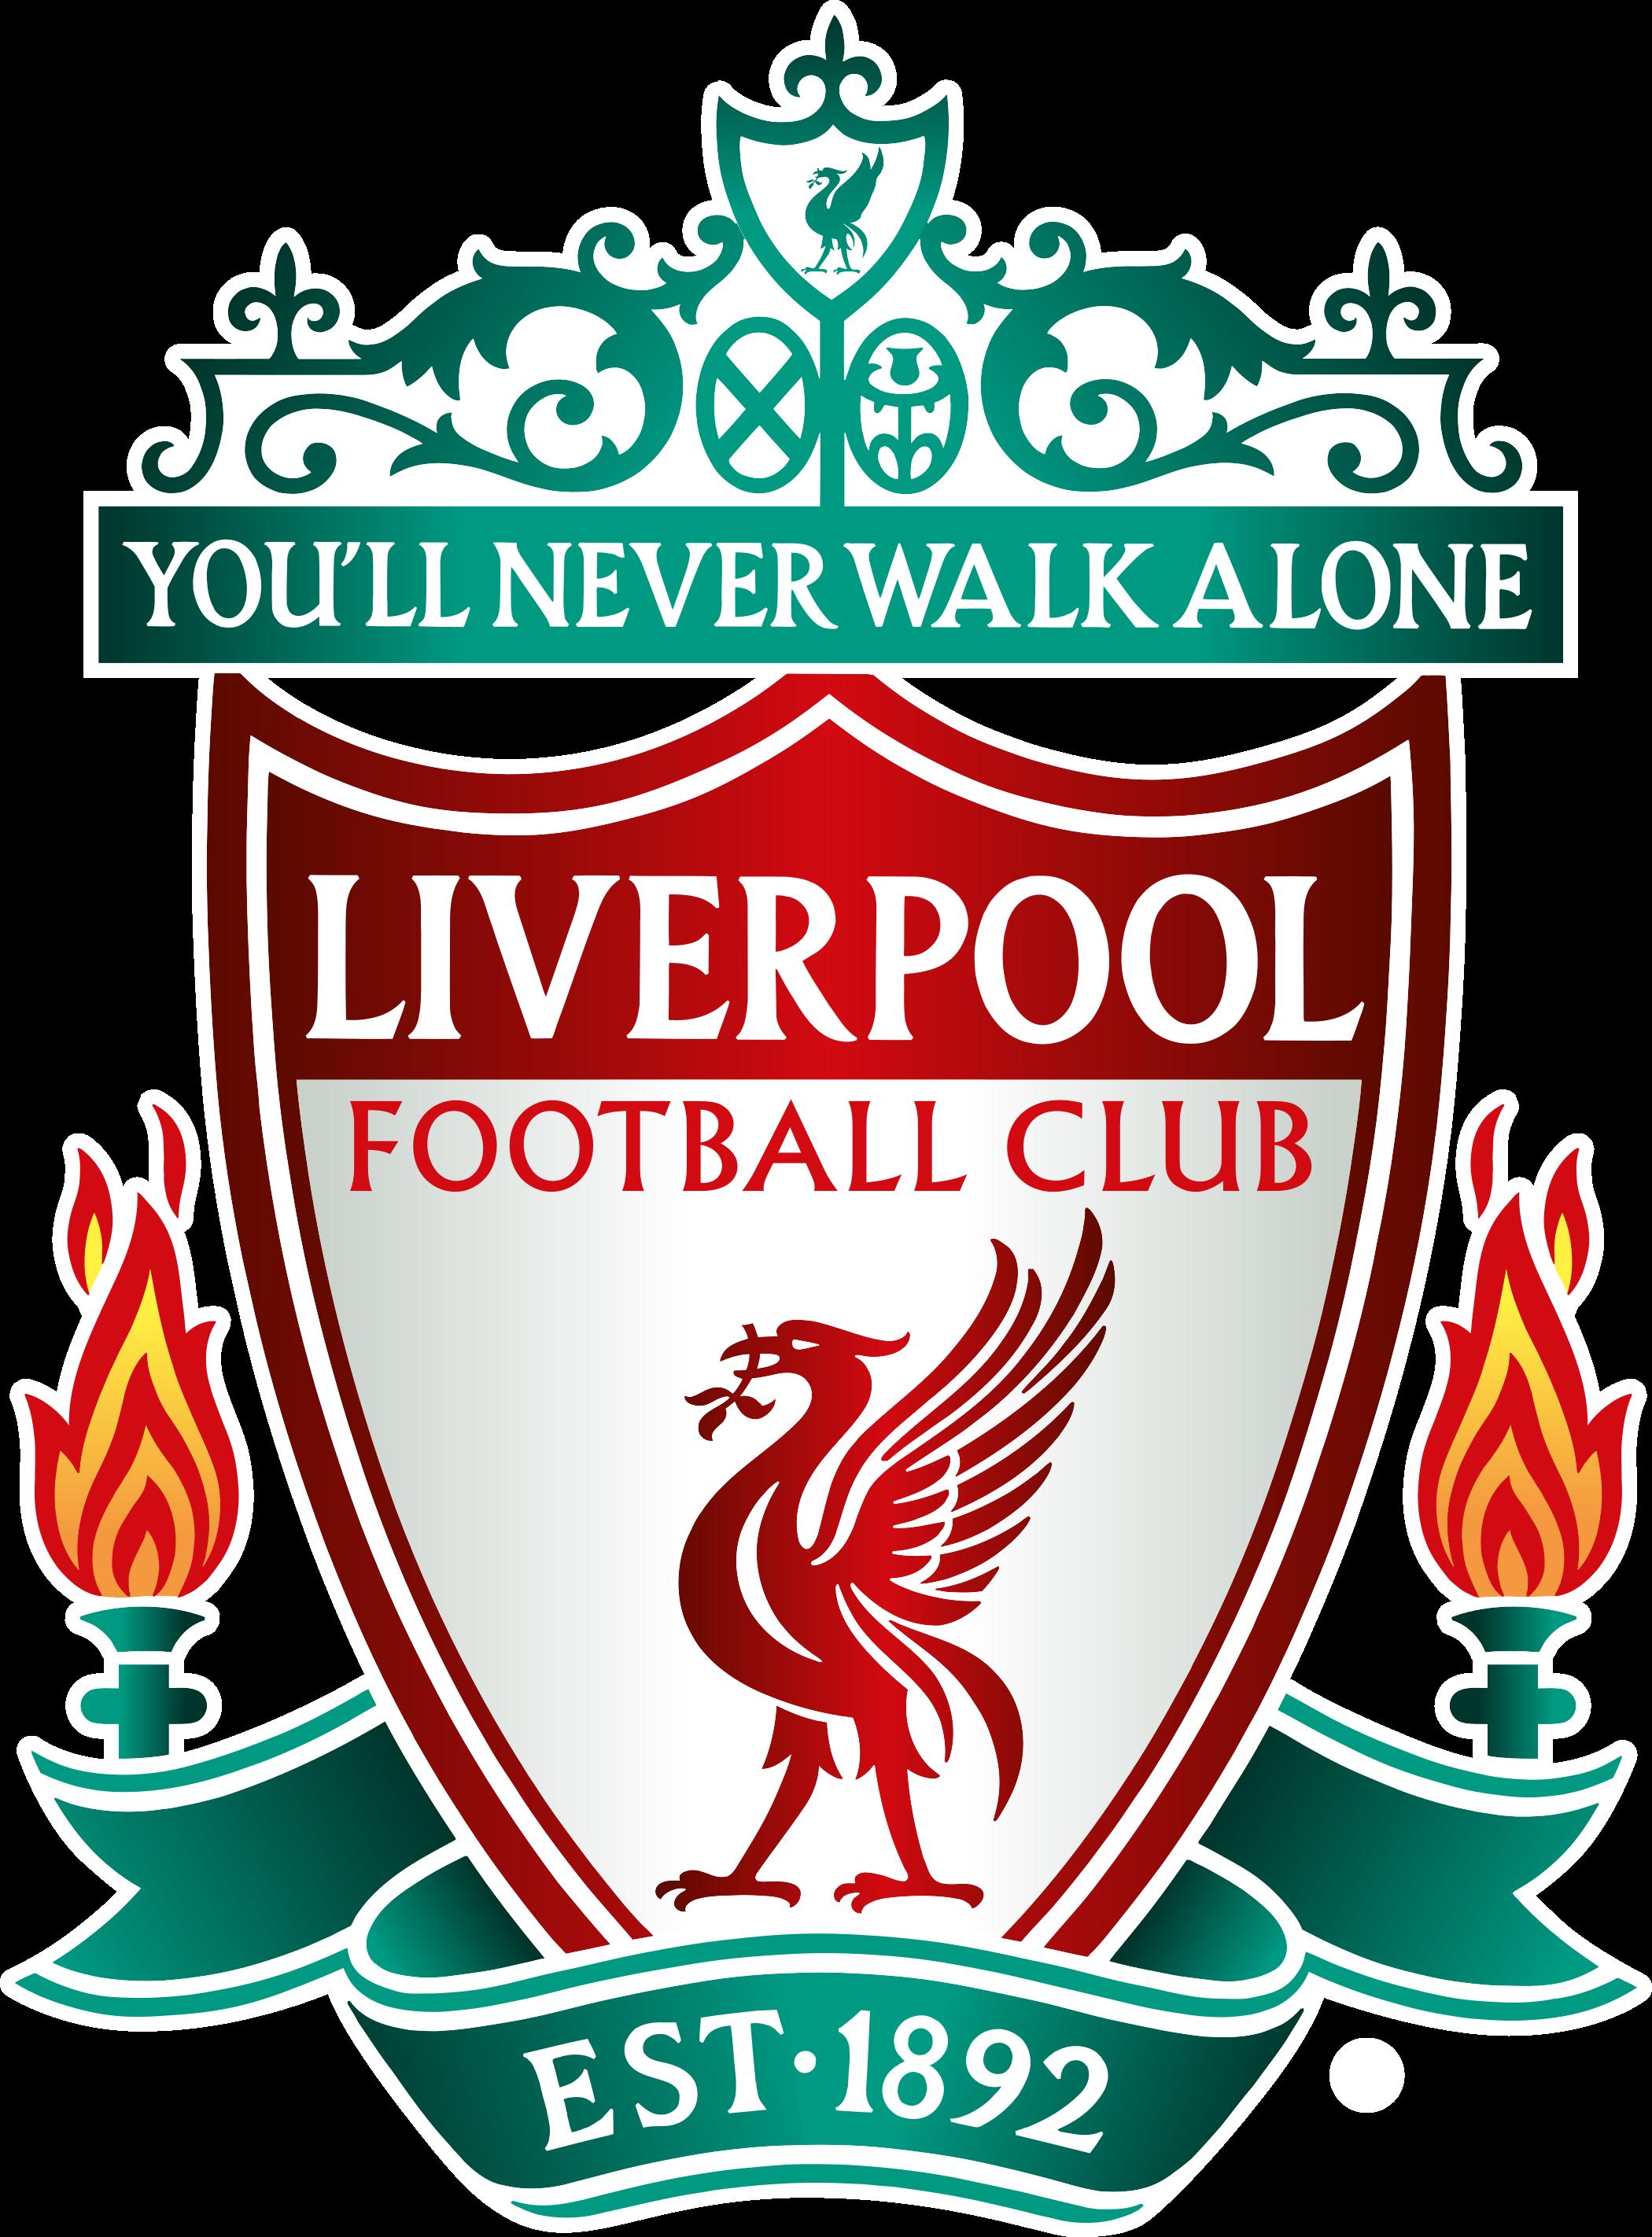 liverpool fc logo escudo 2 - Liverpool FC Logo